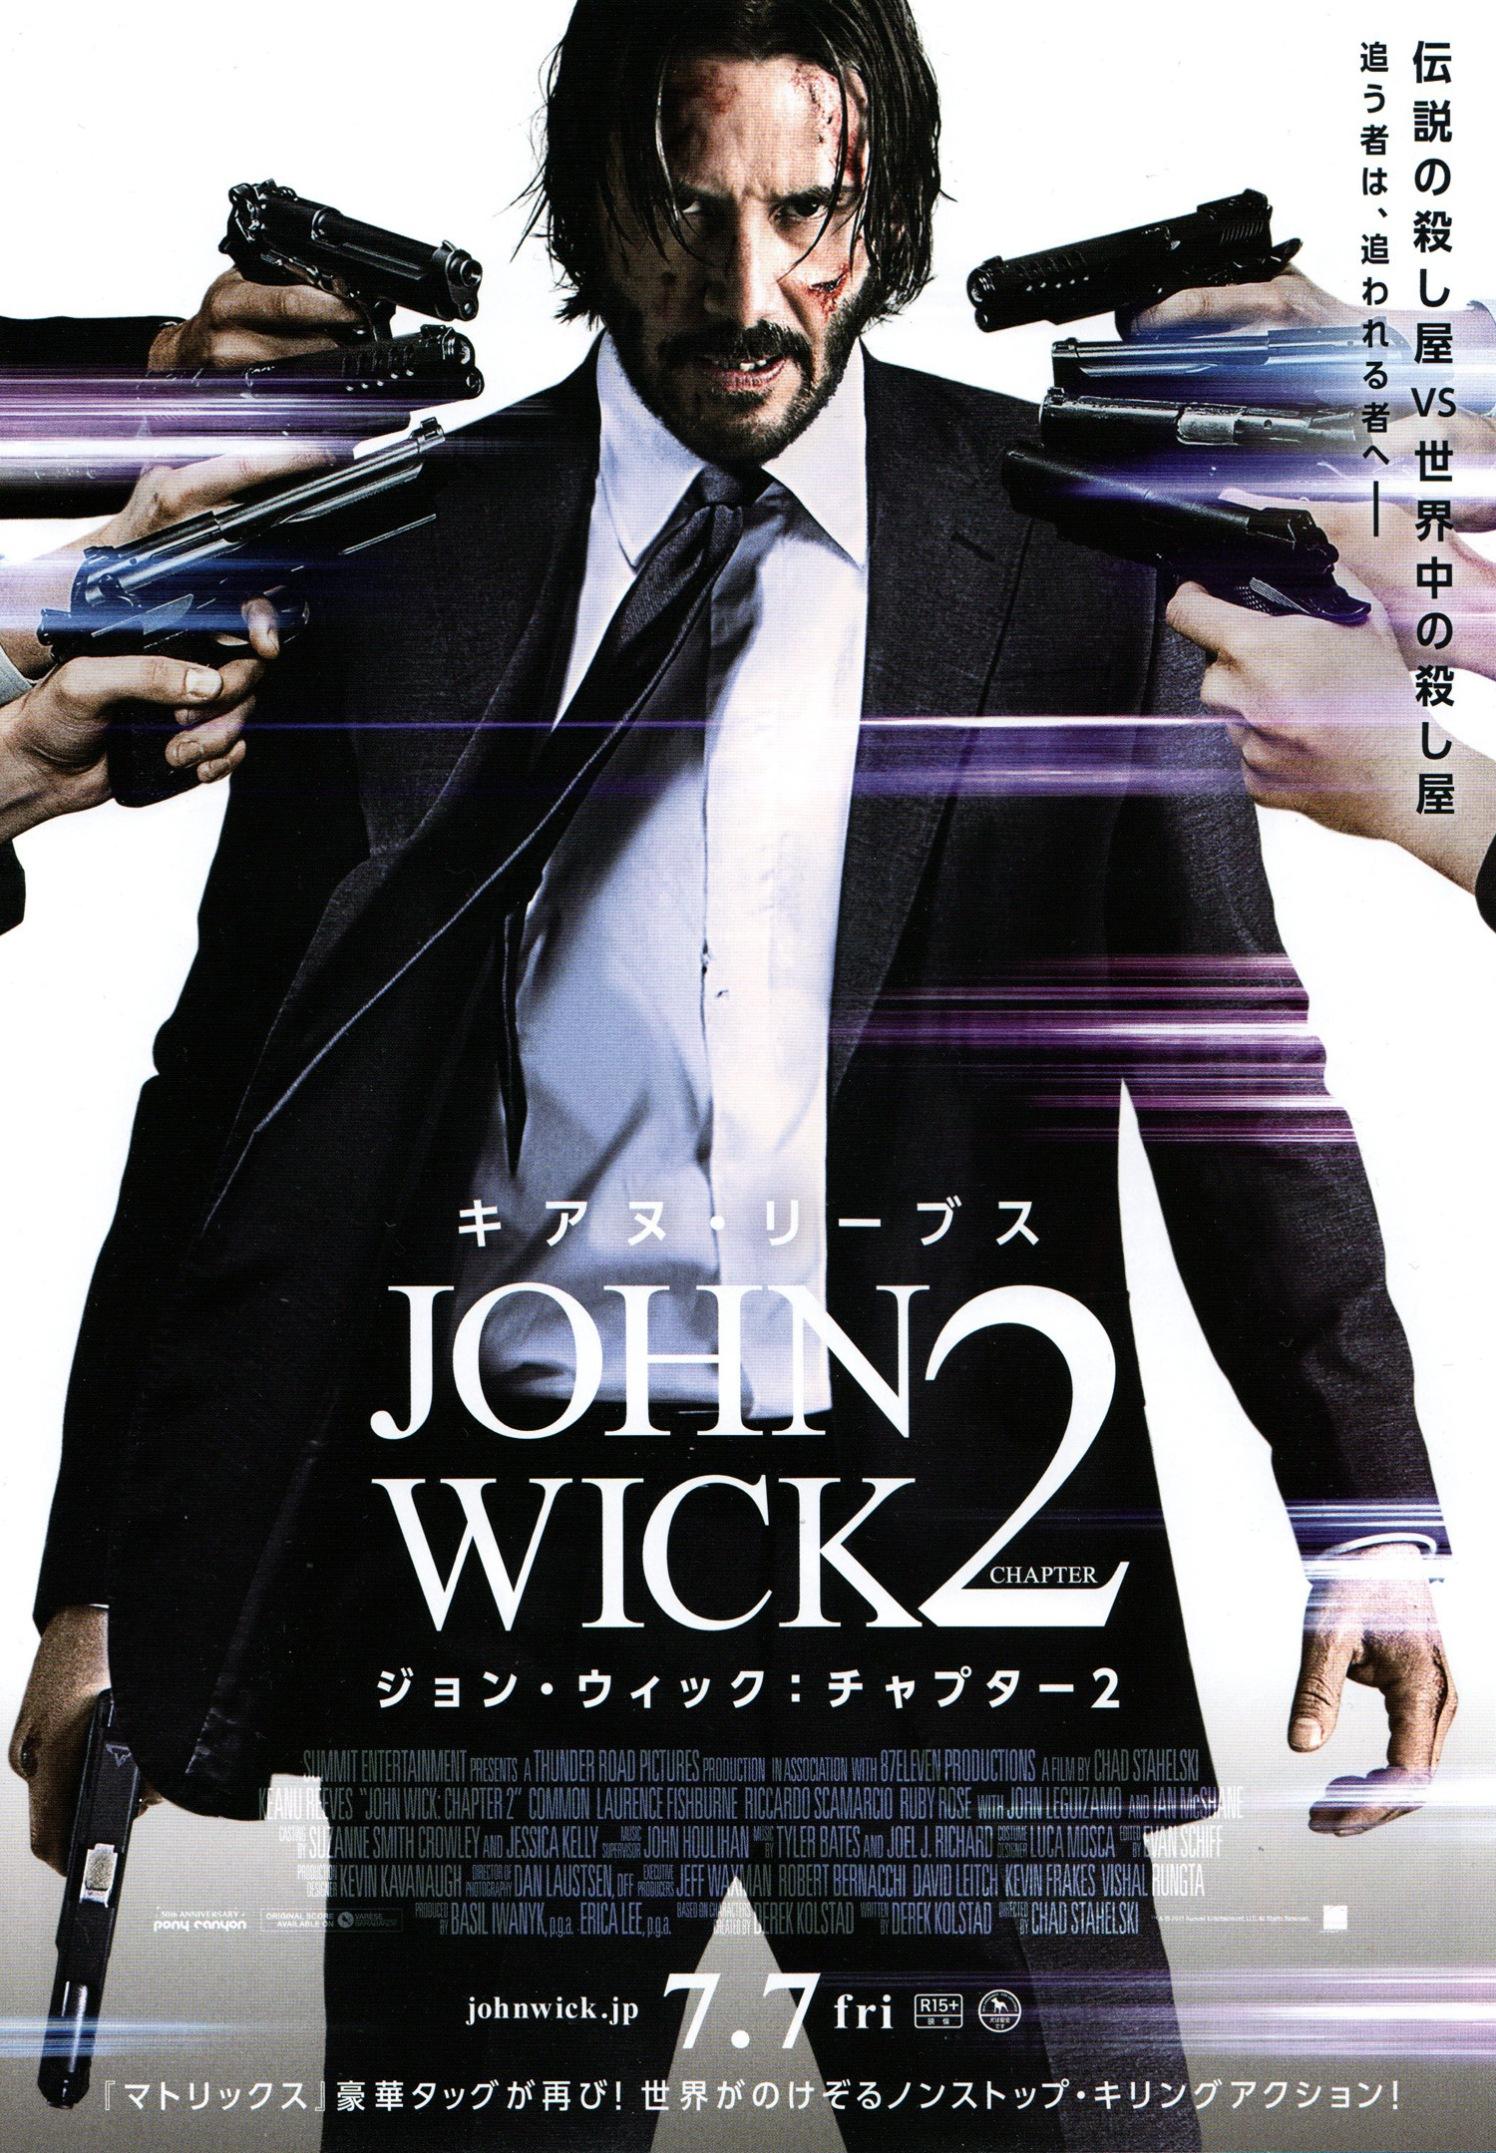 johnwick2_1-japan-1